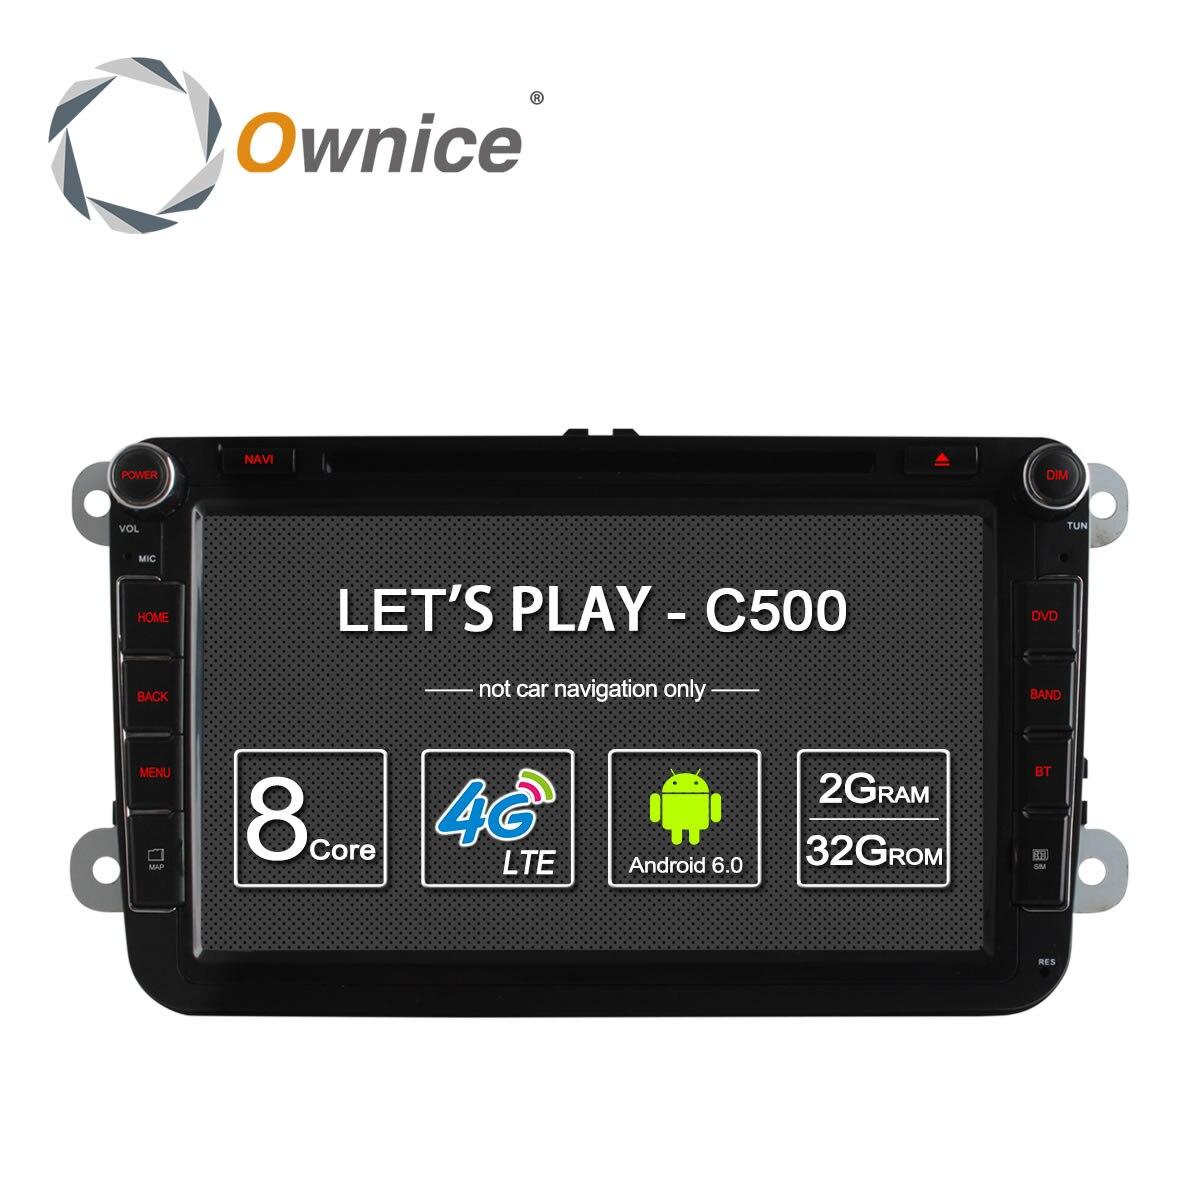 4G SIM LTE Network Ownice C500 Octa 8 Core Android 6.0 2G RAM 2 Din Car DVD GPS Navi Radio Player For VW Skoda Octavia 2 2 din quad core android 4 4 dvd плеер автомобиля для toyota corolla camry rav4 previa vios hilux прадо terios gps navi радио mp3 wi fi